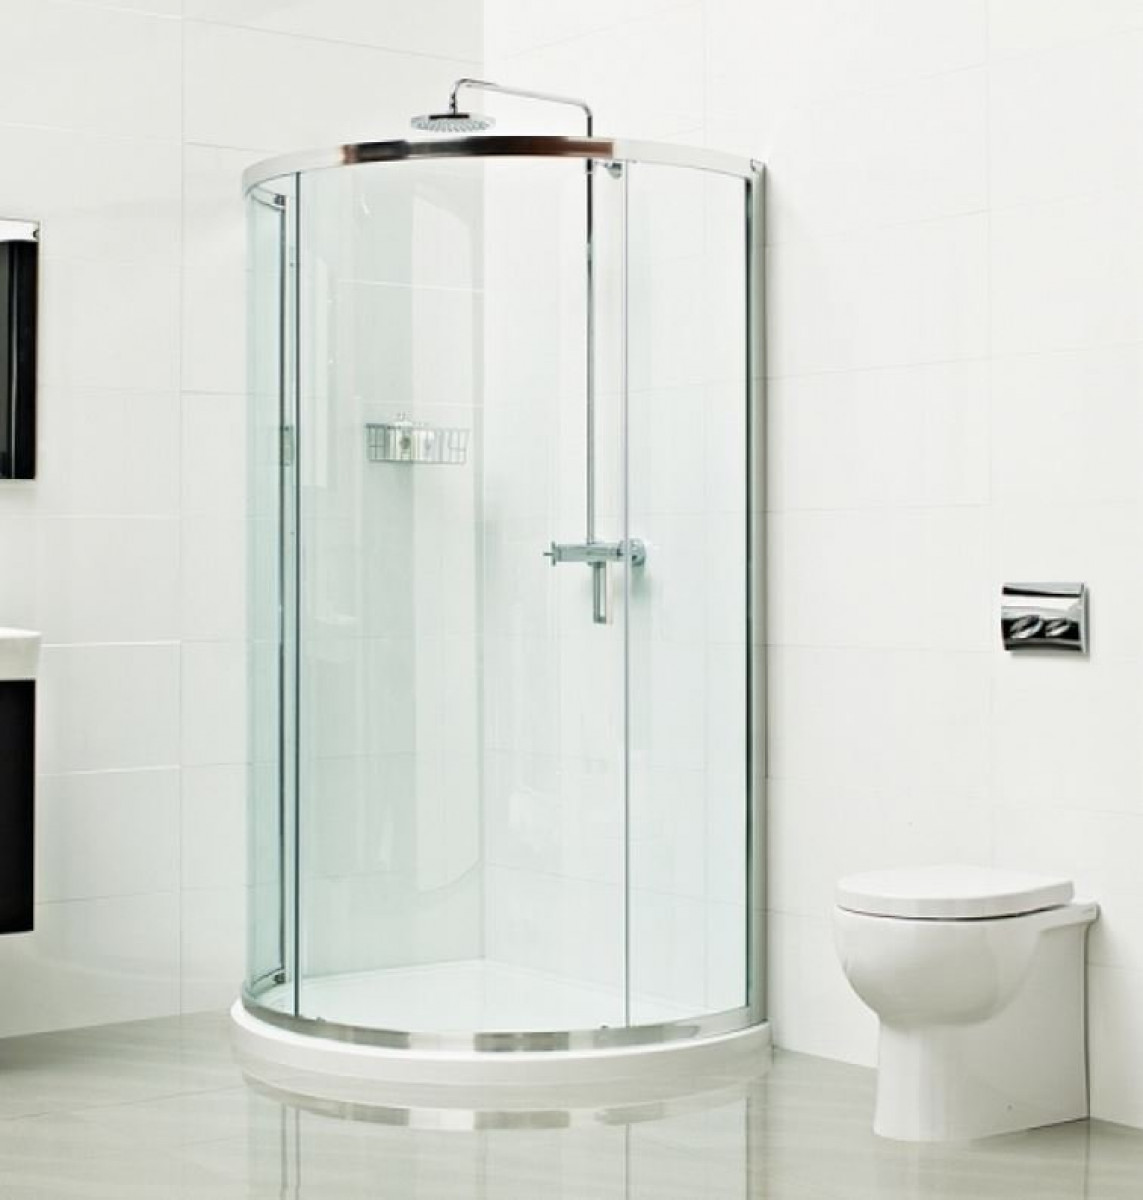 Roman Lumin8 900mm Bow Fronted Quadrant Shower Enclosure